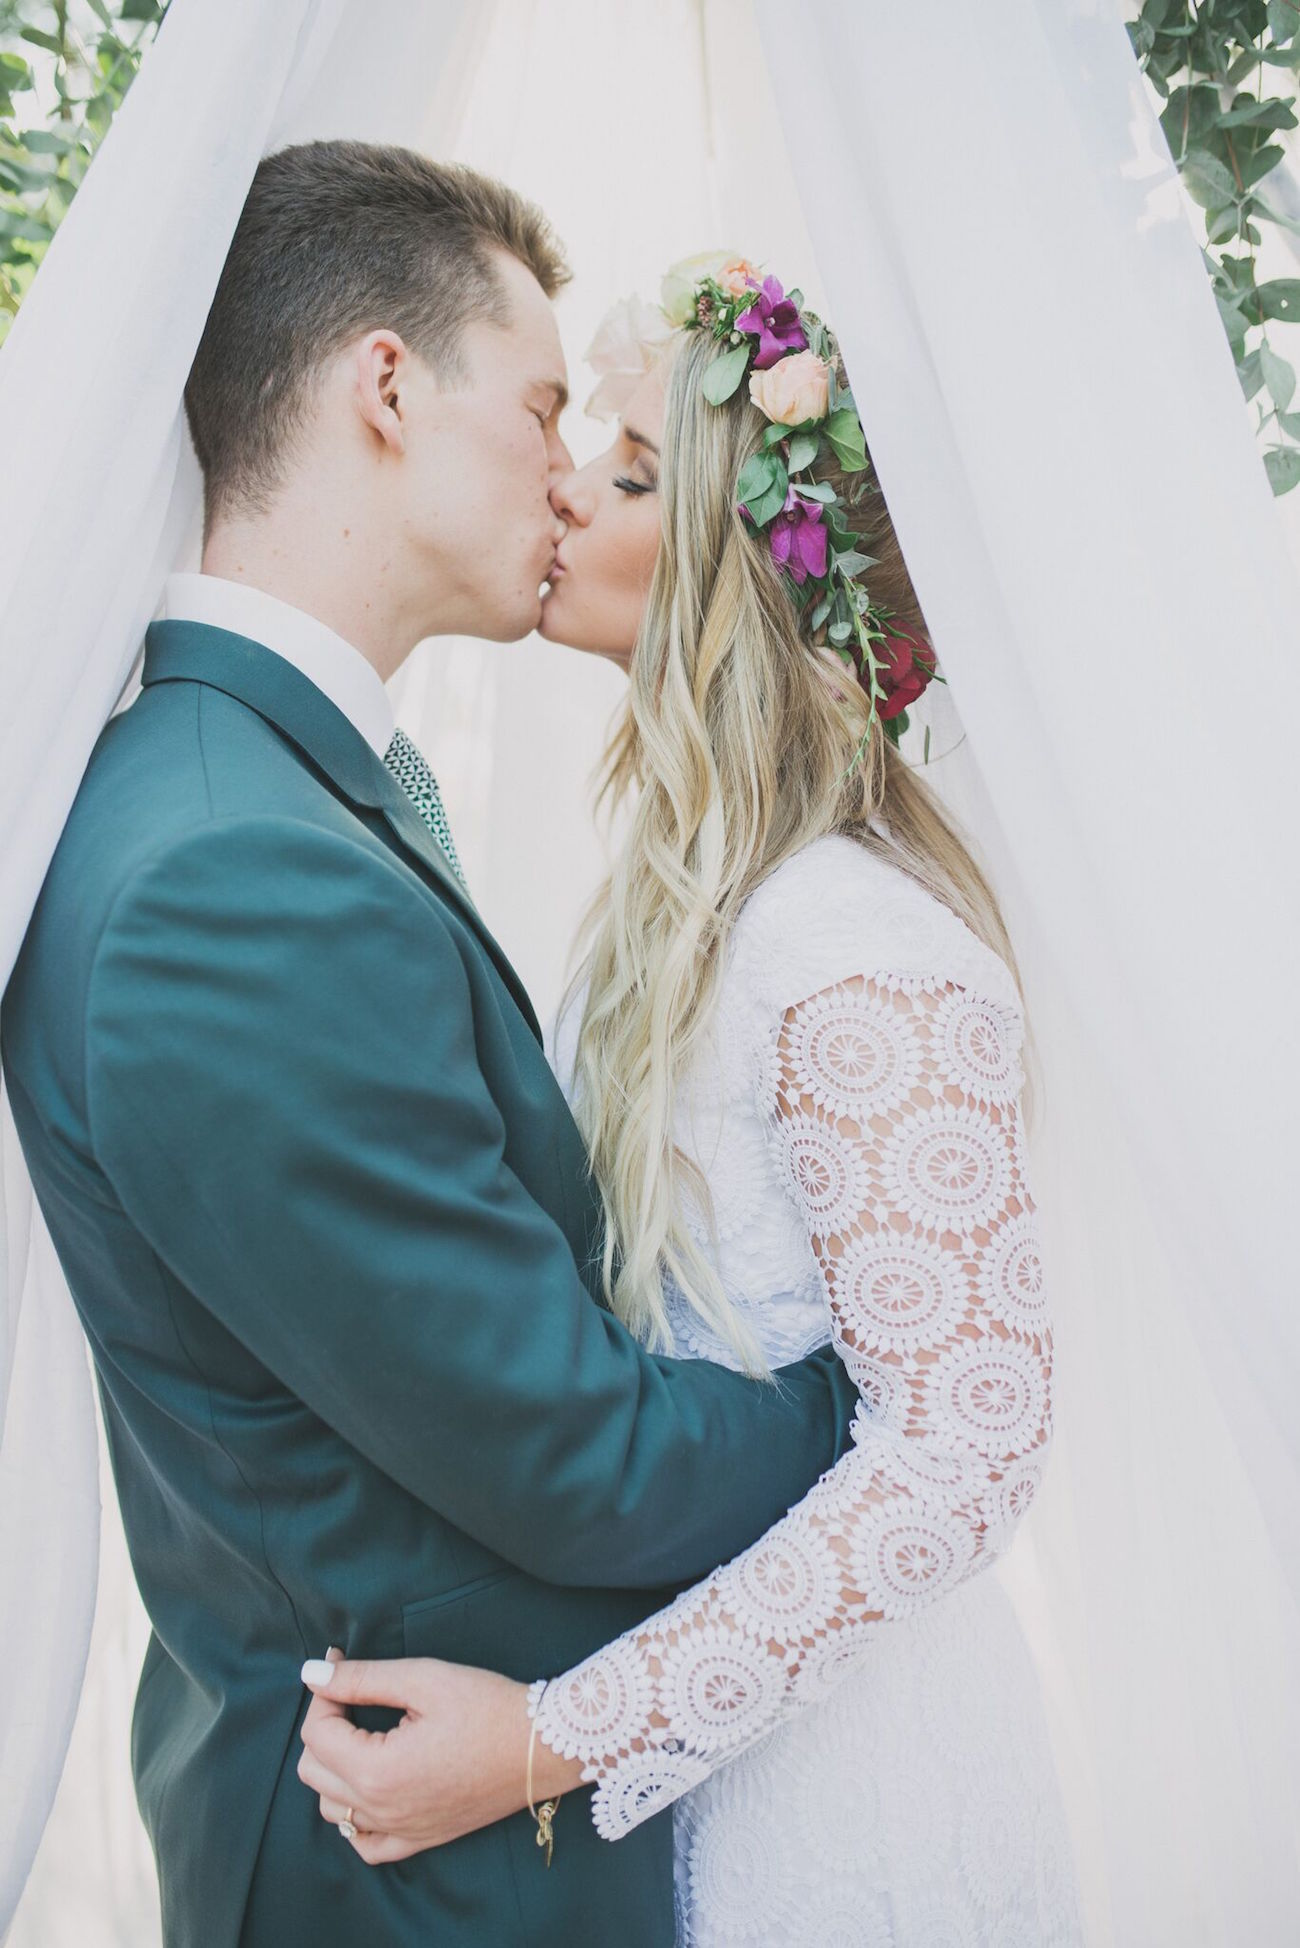 Lace Sleeve Boho Wedding Dress | Credit: Vicky Bergallo